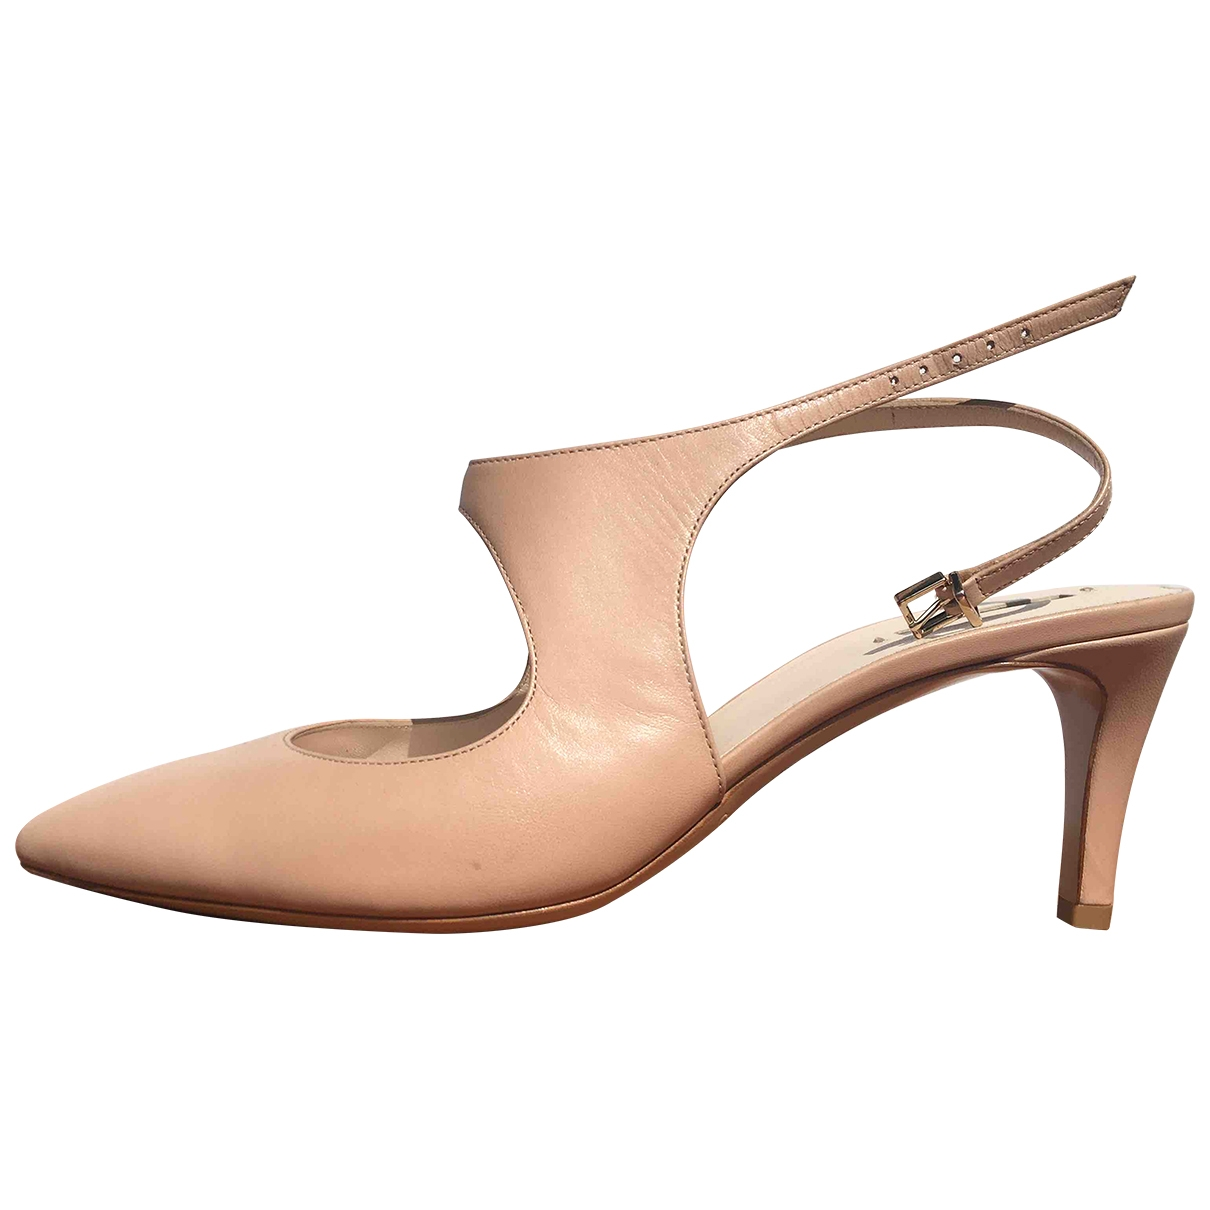 Giorgio Armani - Escarpins   pour femme en cuir - rose